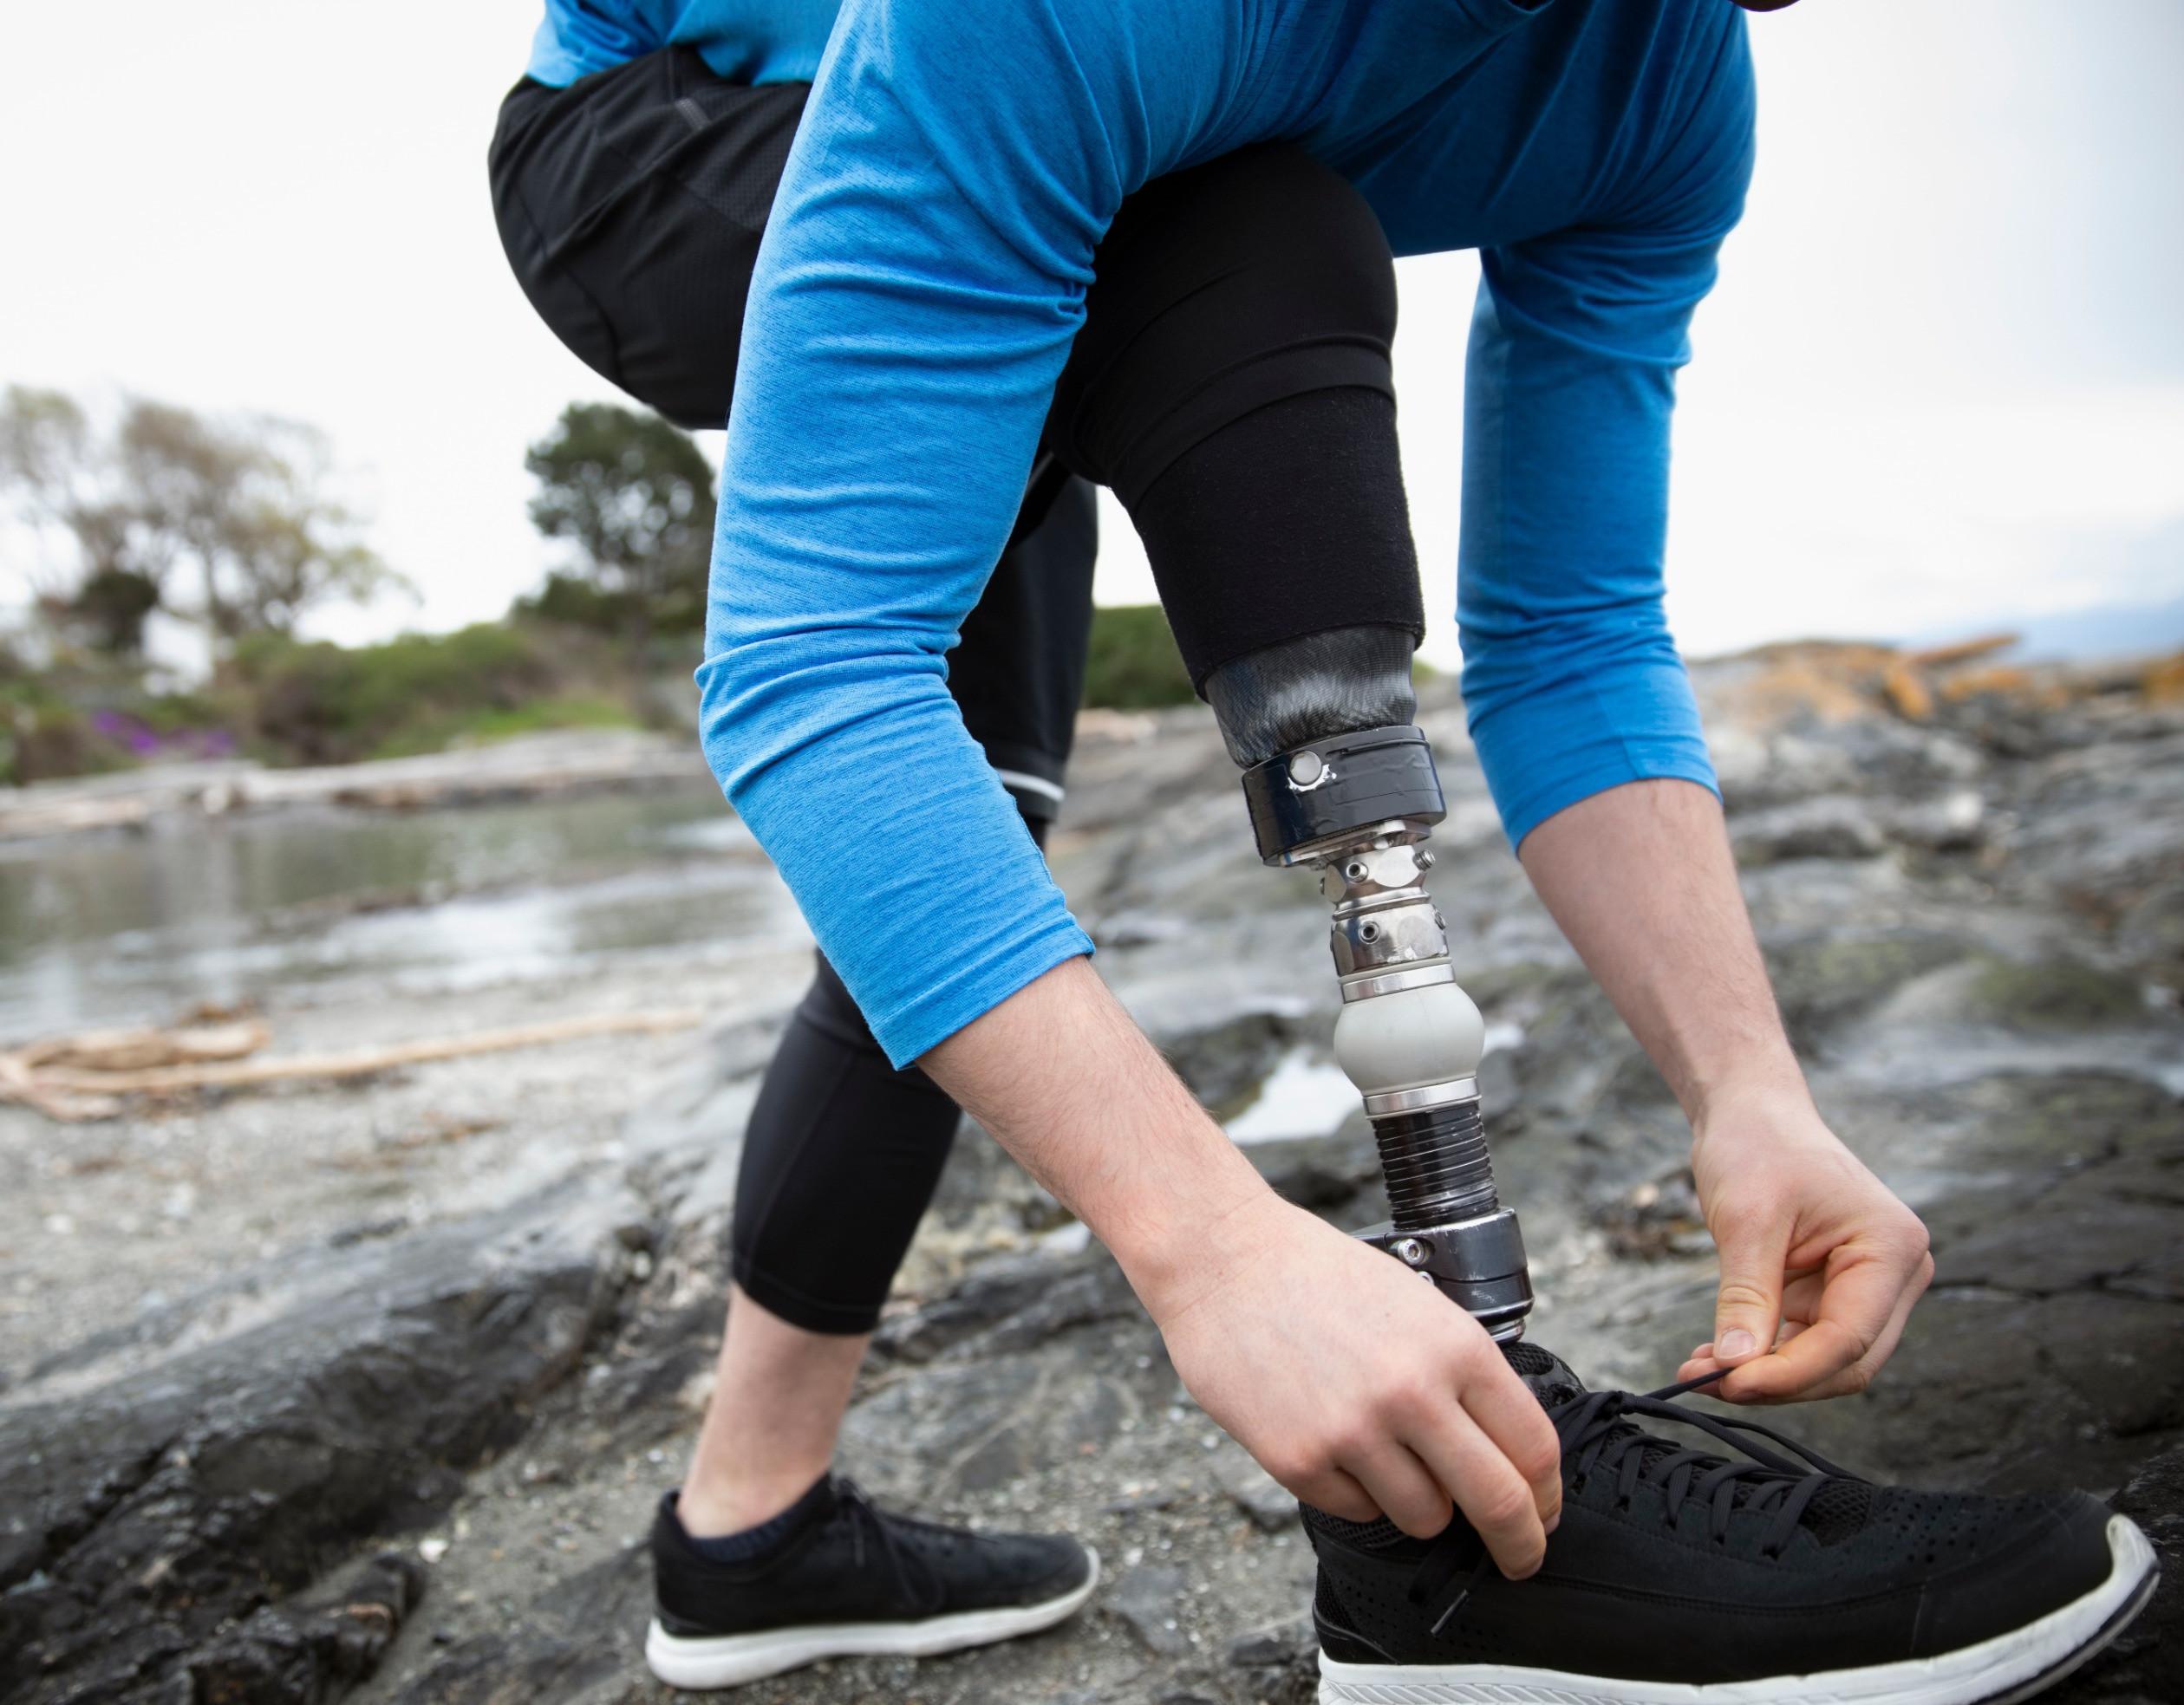 Lower Limb Evaluation